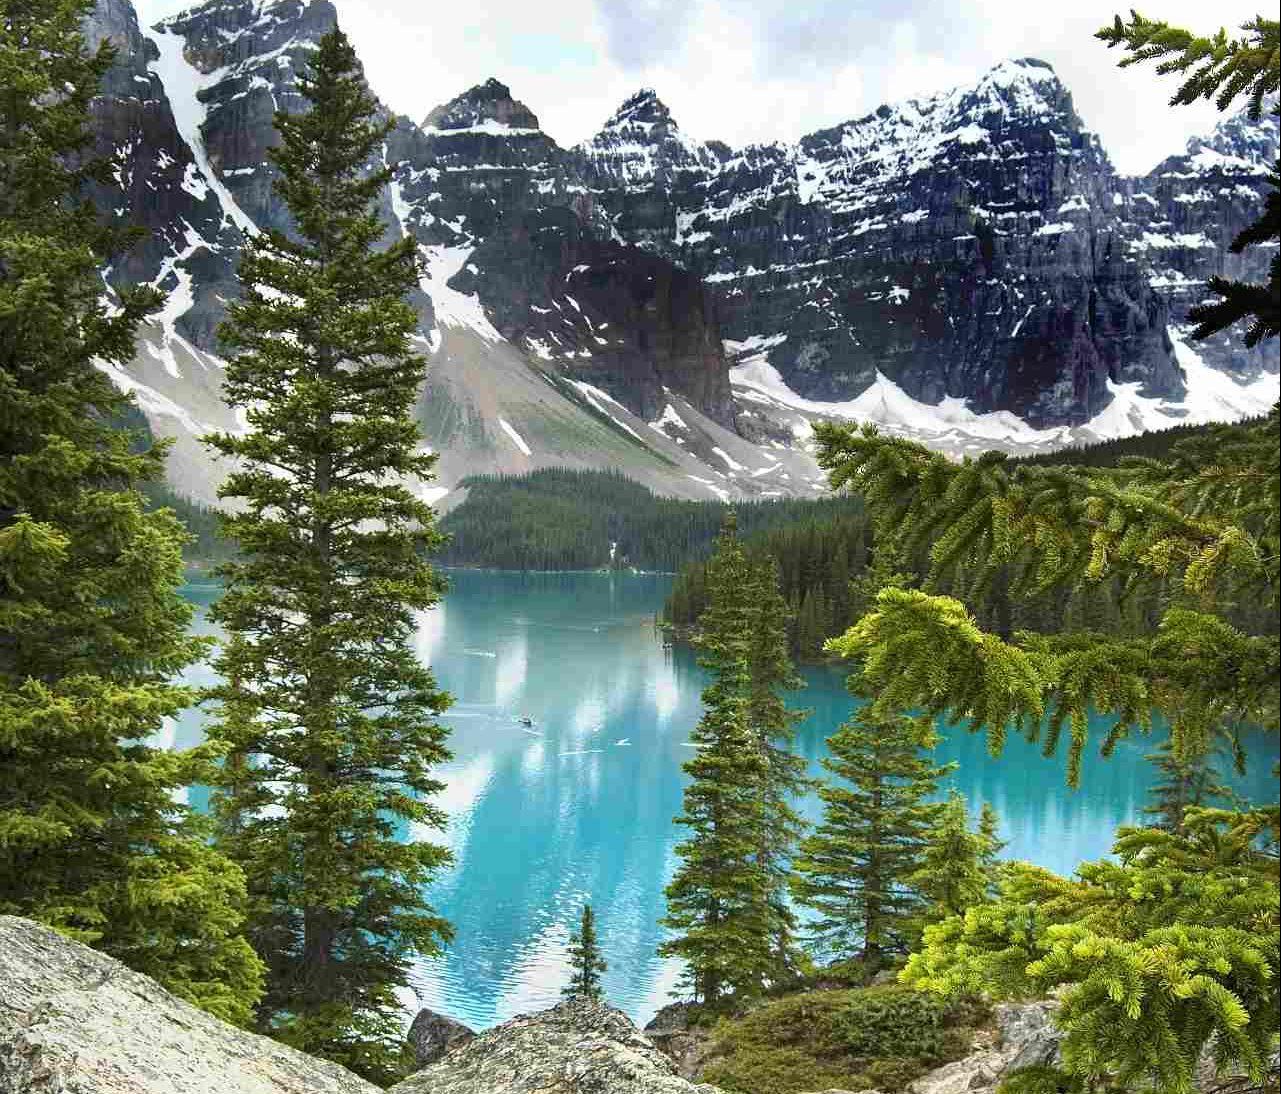 PhotoFly Travel Club | Canada Group Tour | PhotoFly Travel Club